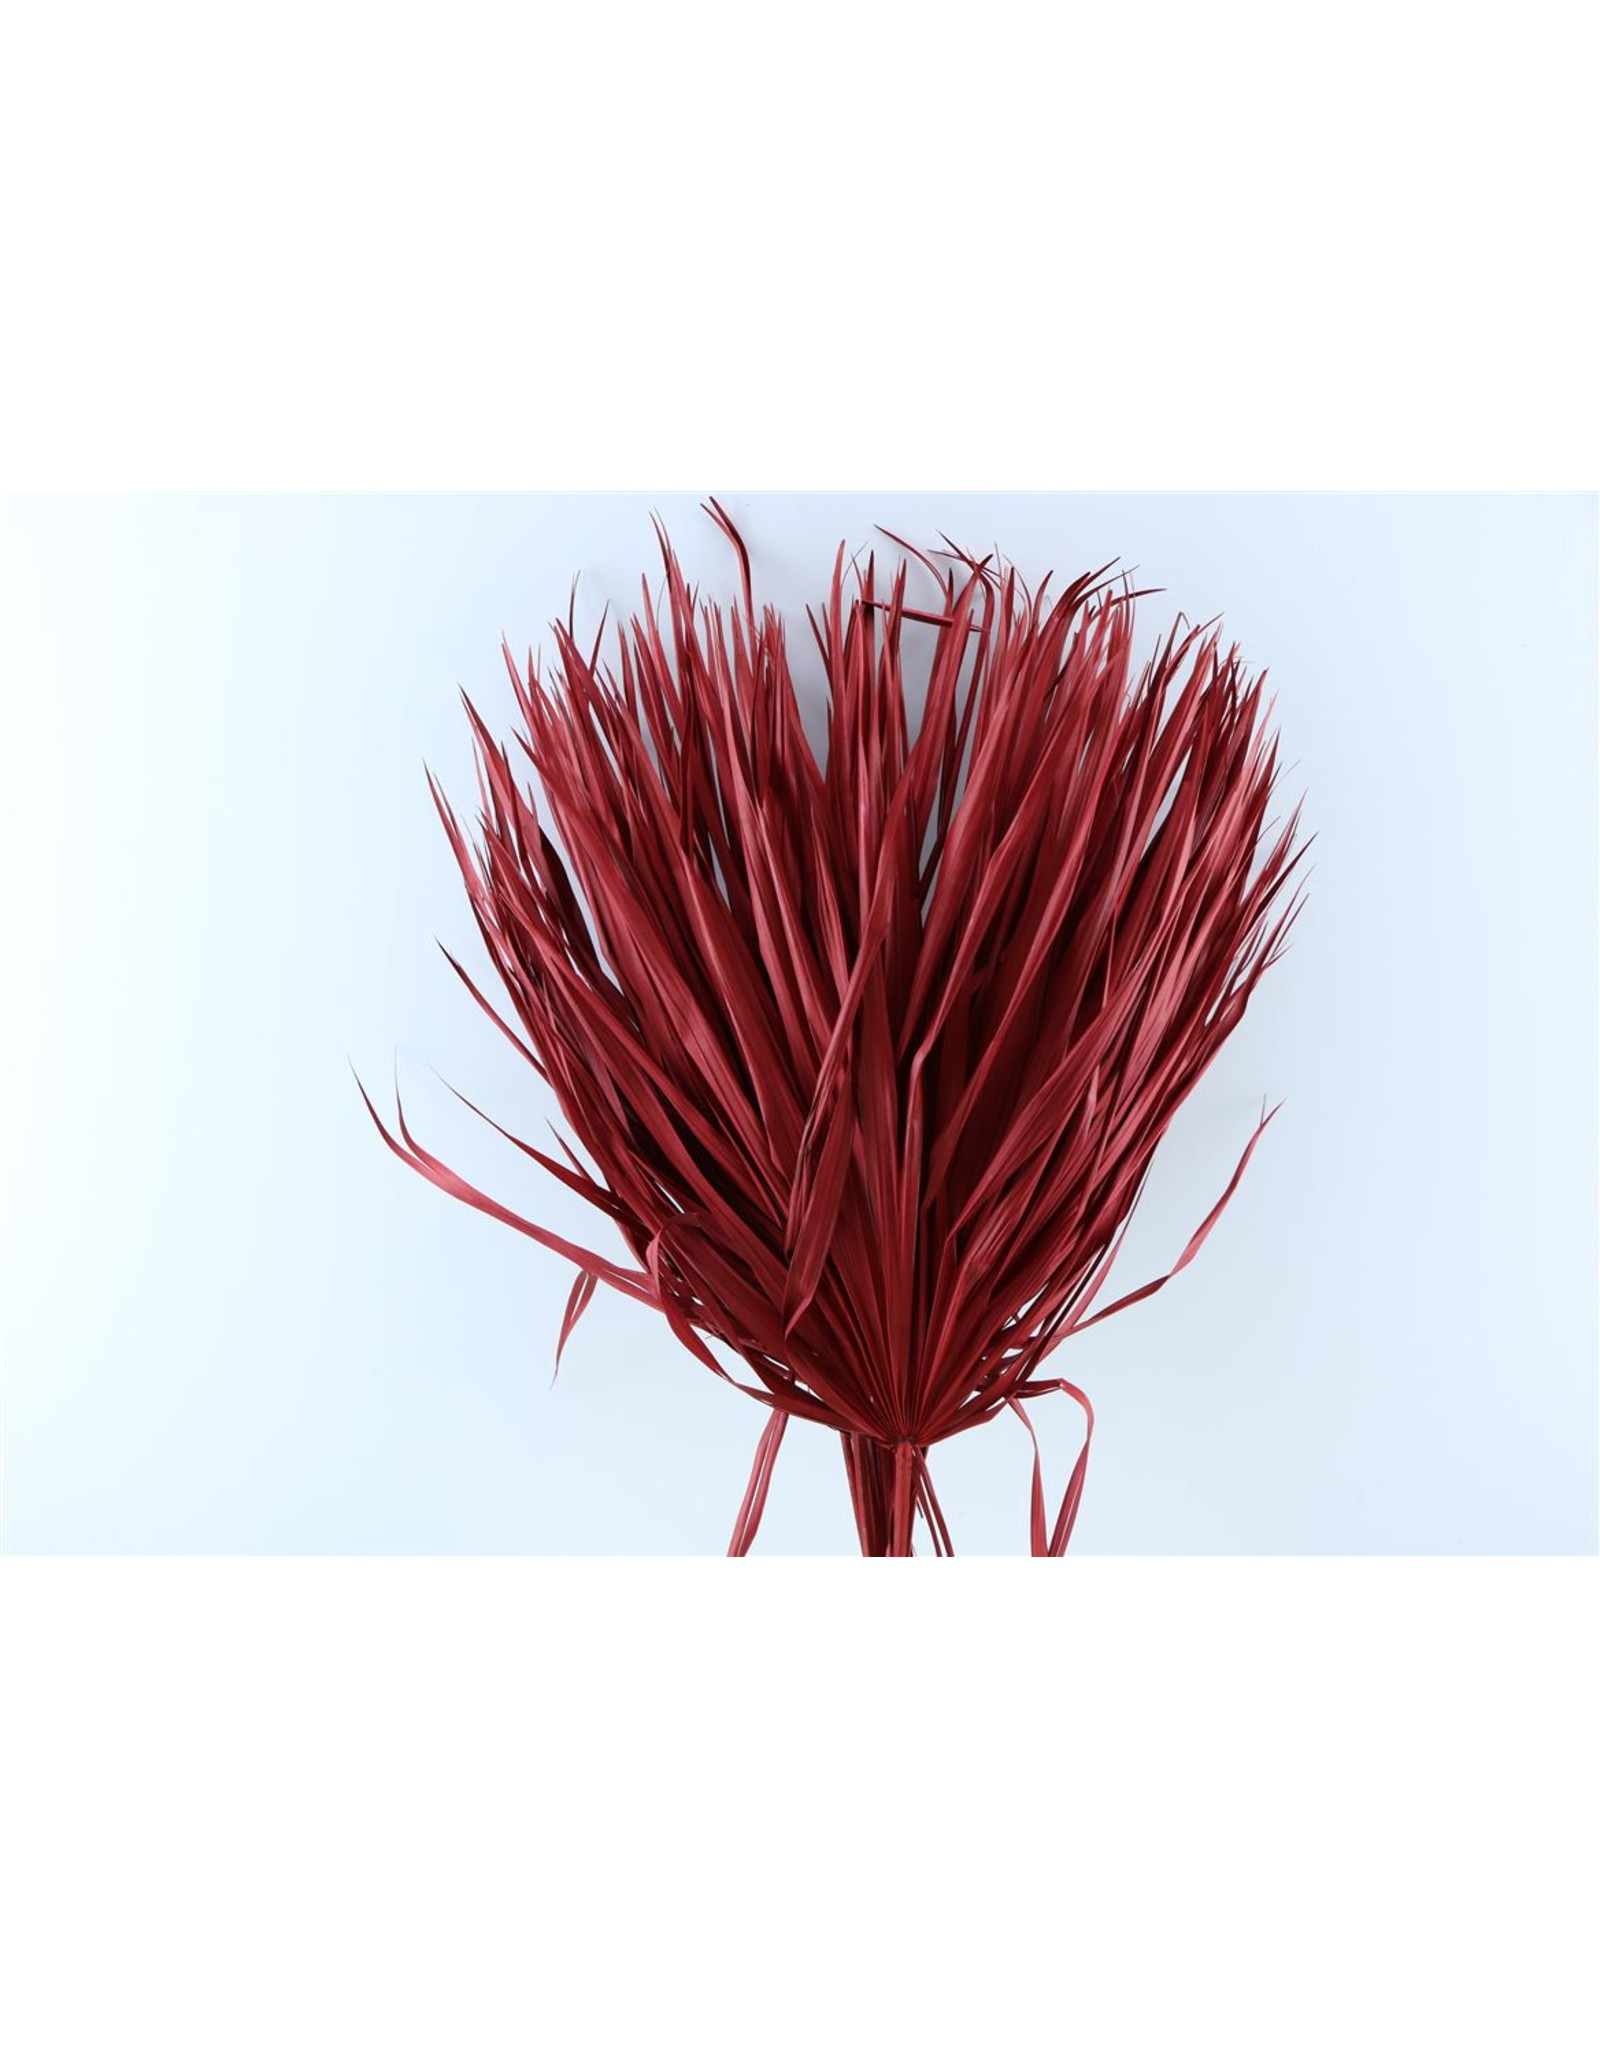 Dried Chamaerops (10tk) Red Bunch x 1